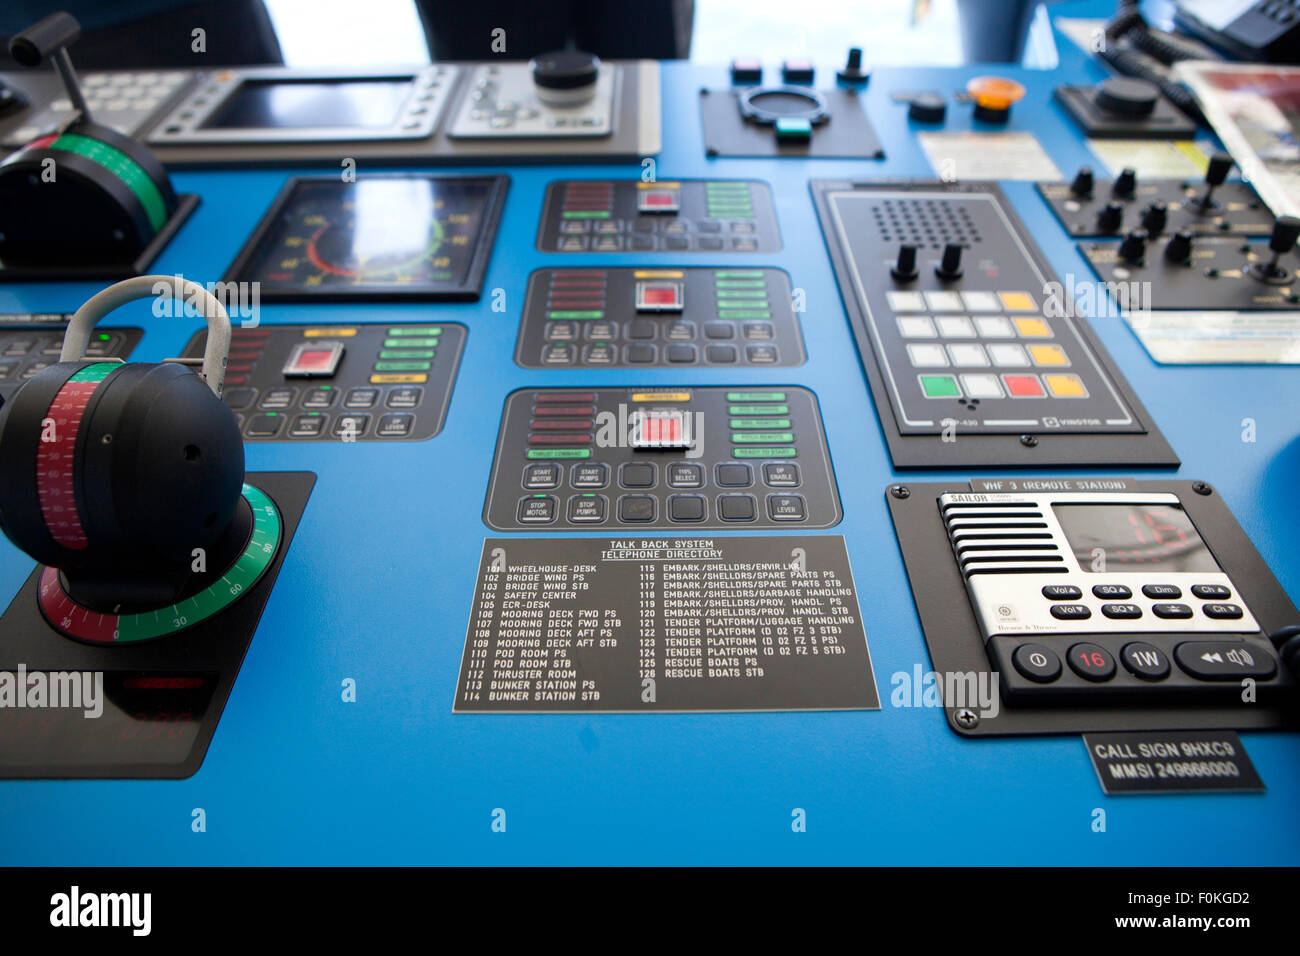 Inside A Modern Cruise Ship Bridge Navigating In The Ocean The - Cruise ship controls